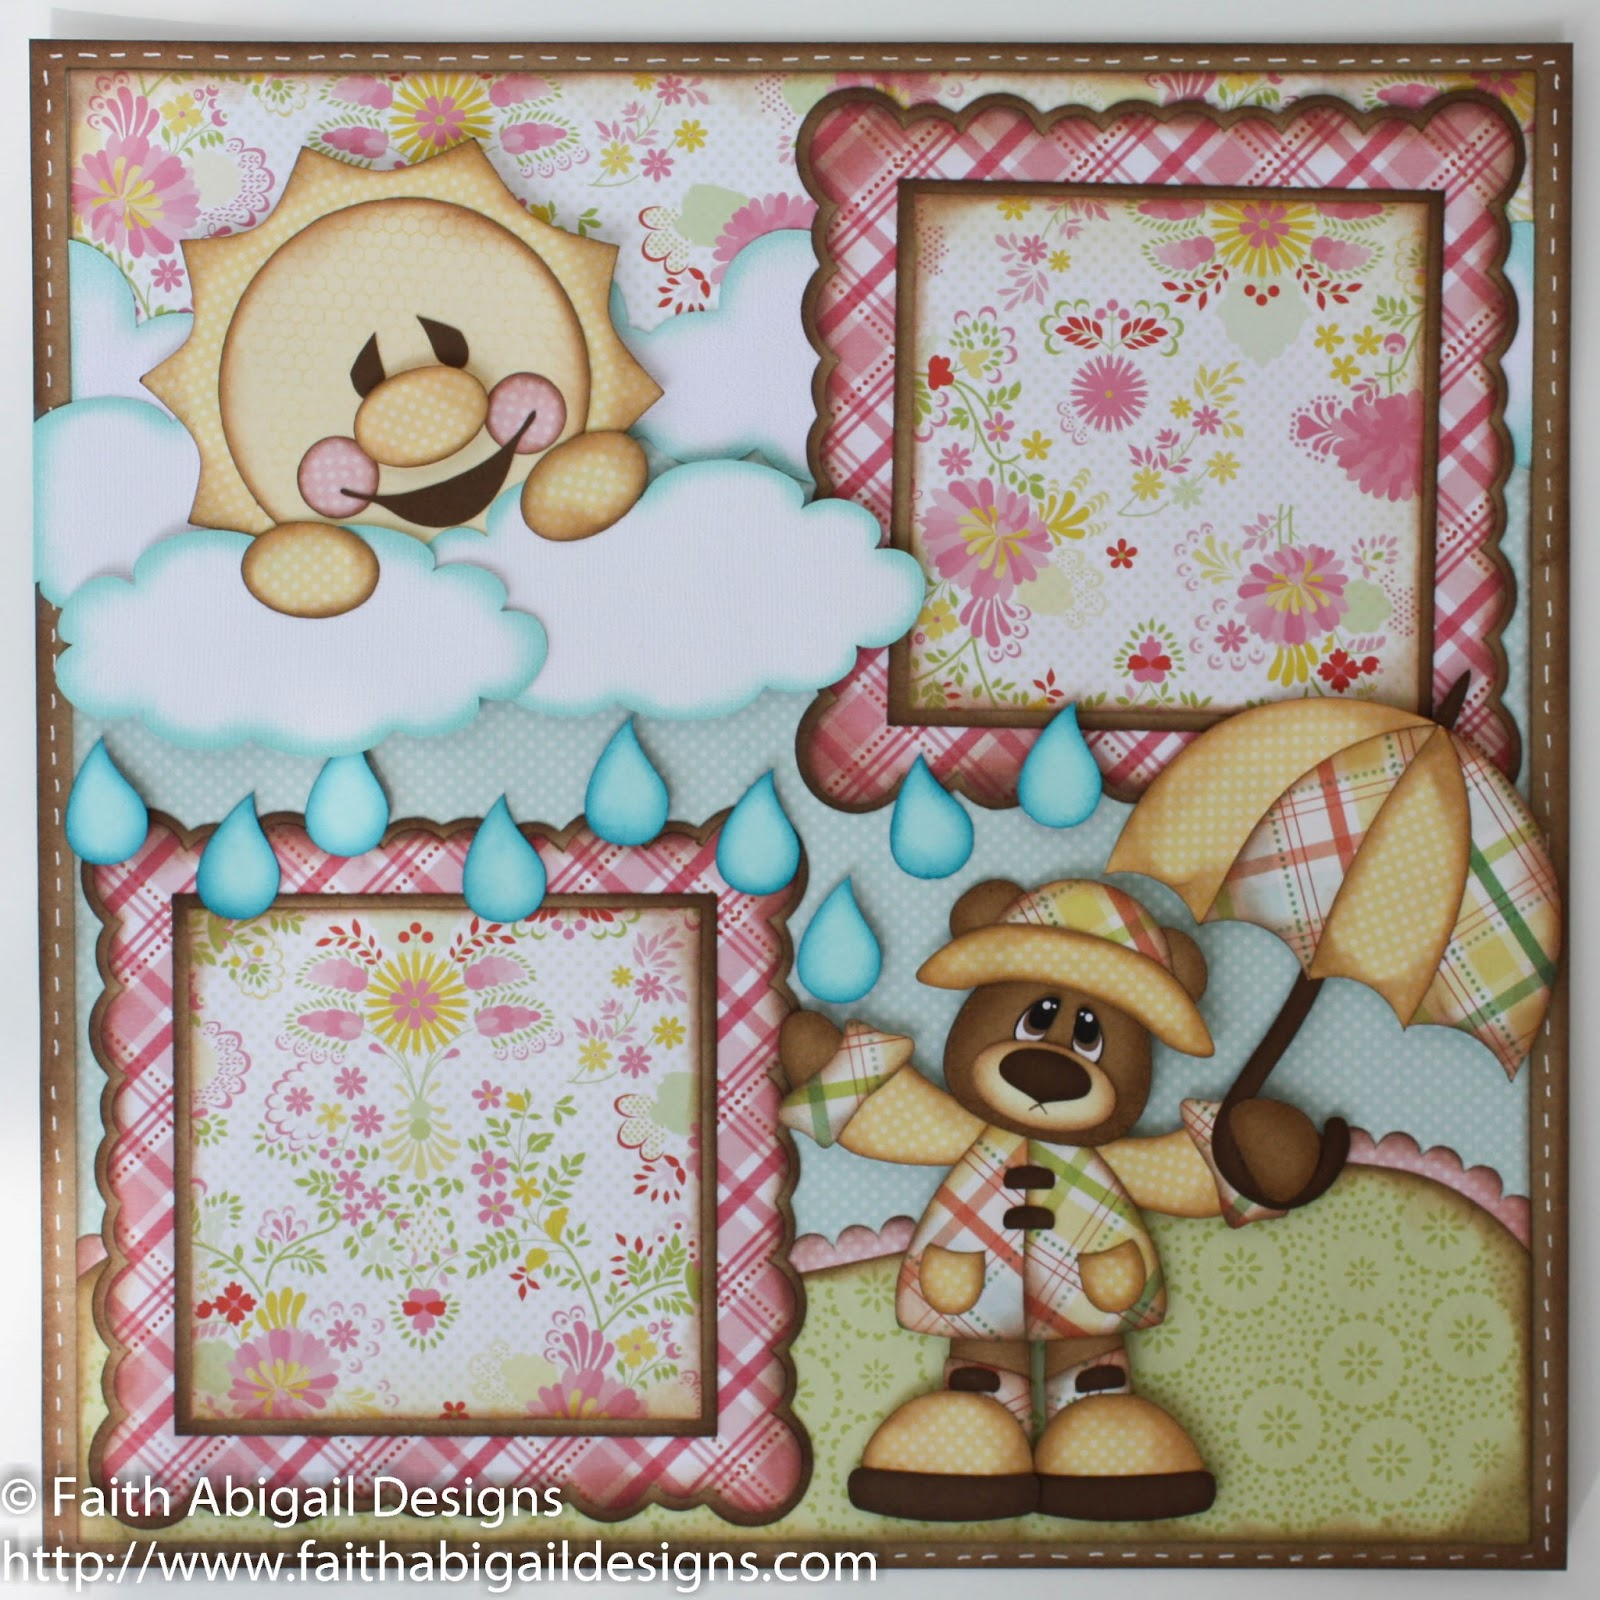 Scrapbook ideas and designs - Rainy Day Bear Scrapbook Layout